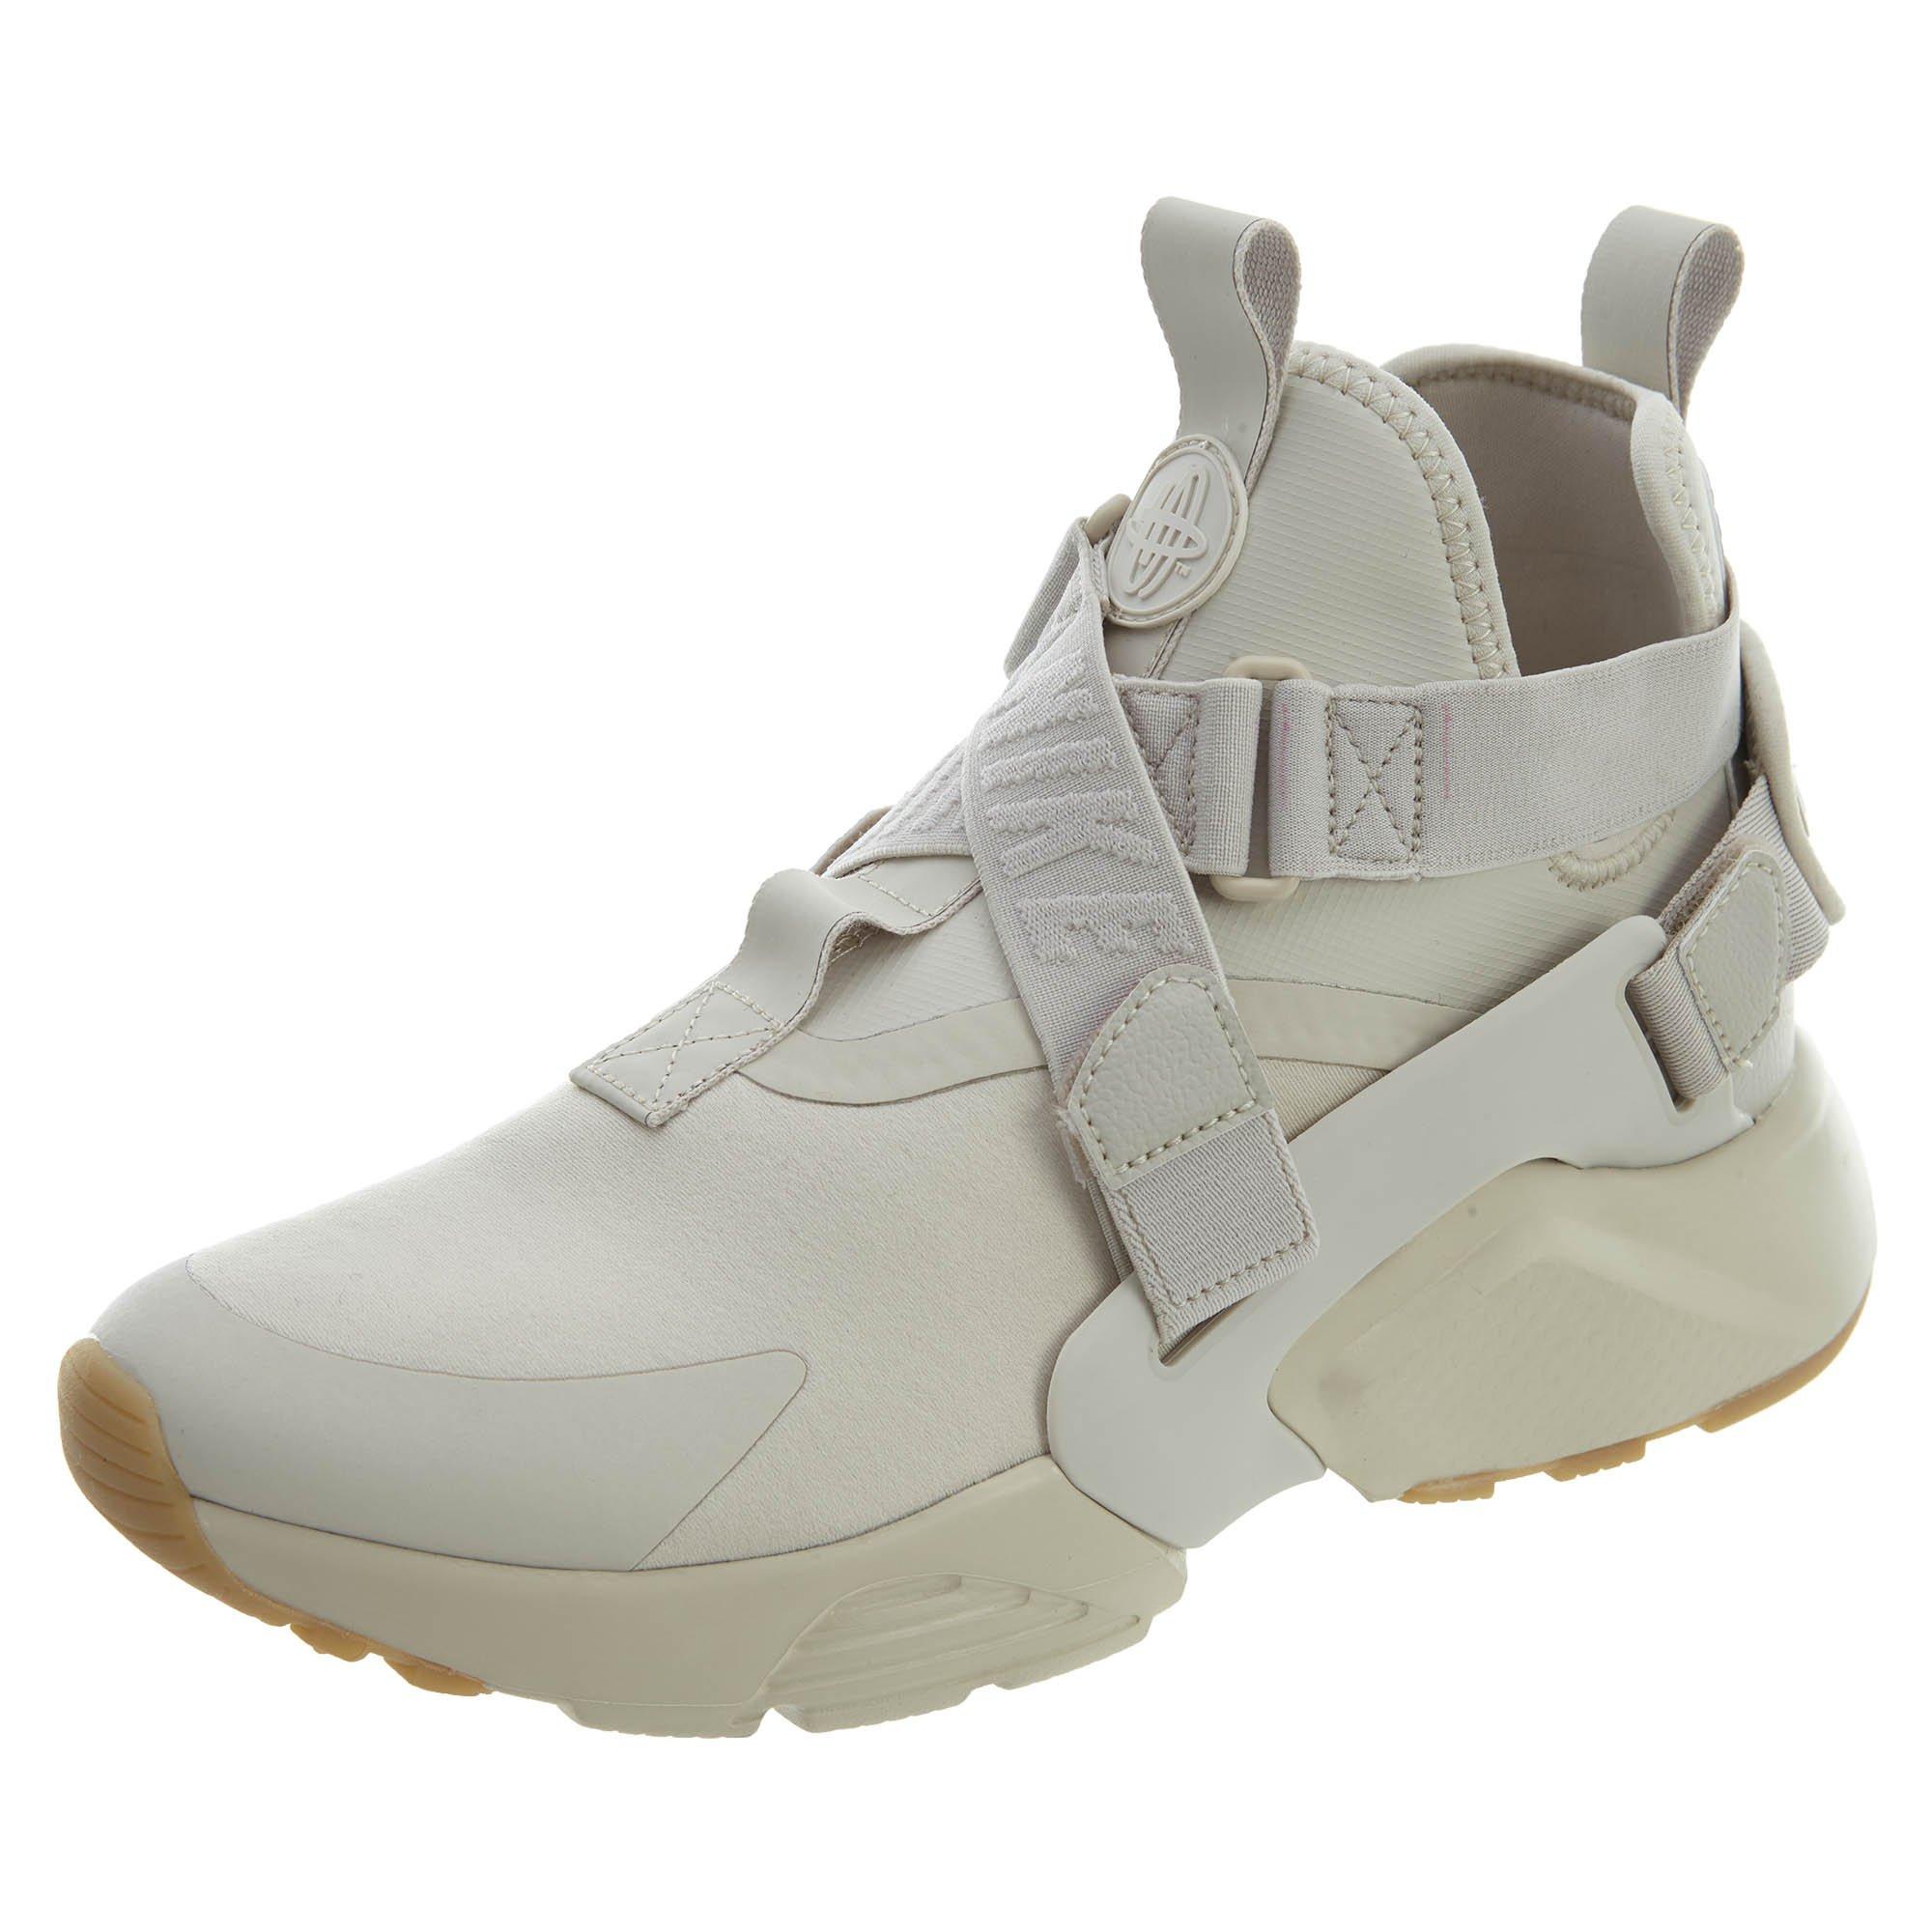 the best attitude bebfc 83256 Galleon - NIKE Women s Air Huarache City Low-Top Sneakers, Beige (Desert  Sand Desert Sand-White-Gum Light Brown 001), 7 UK 41 EU